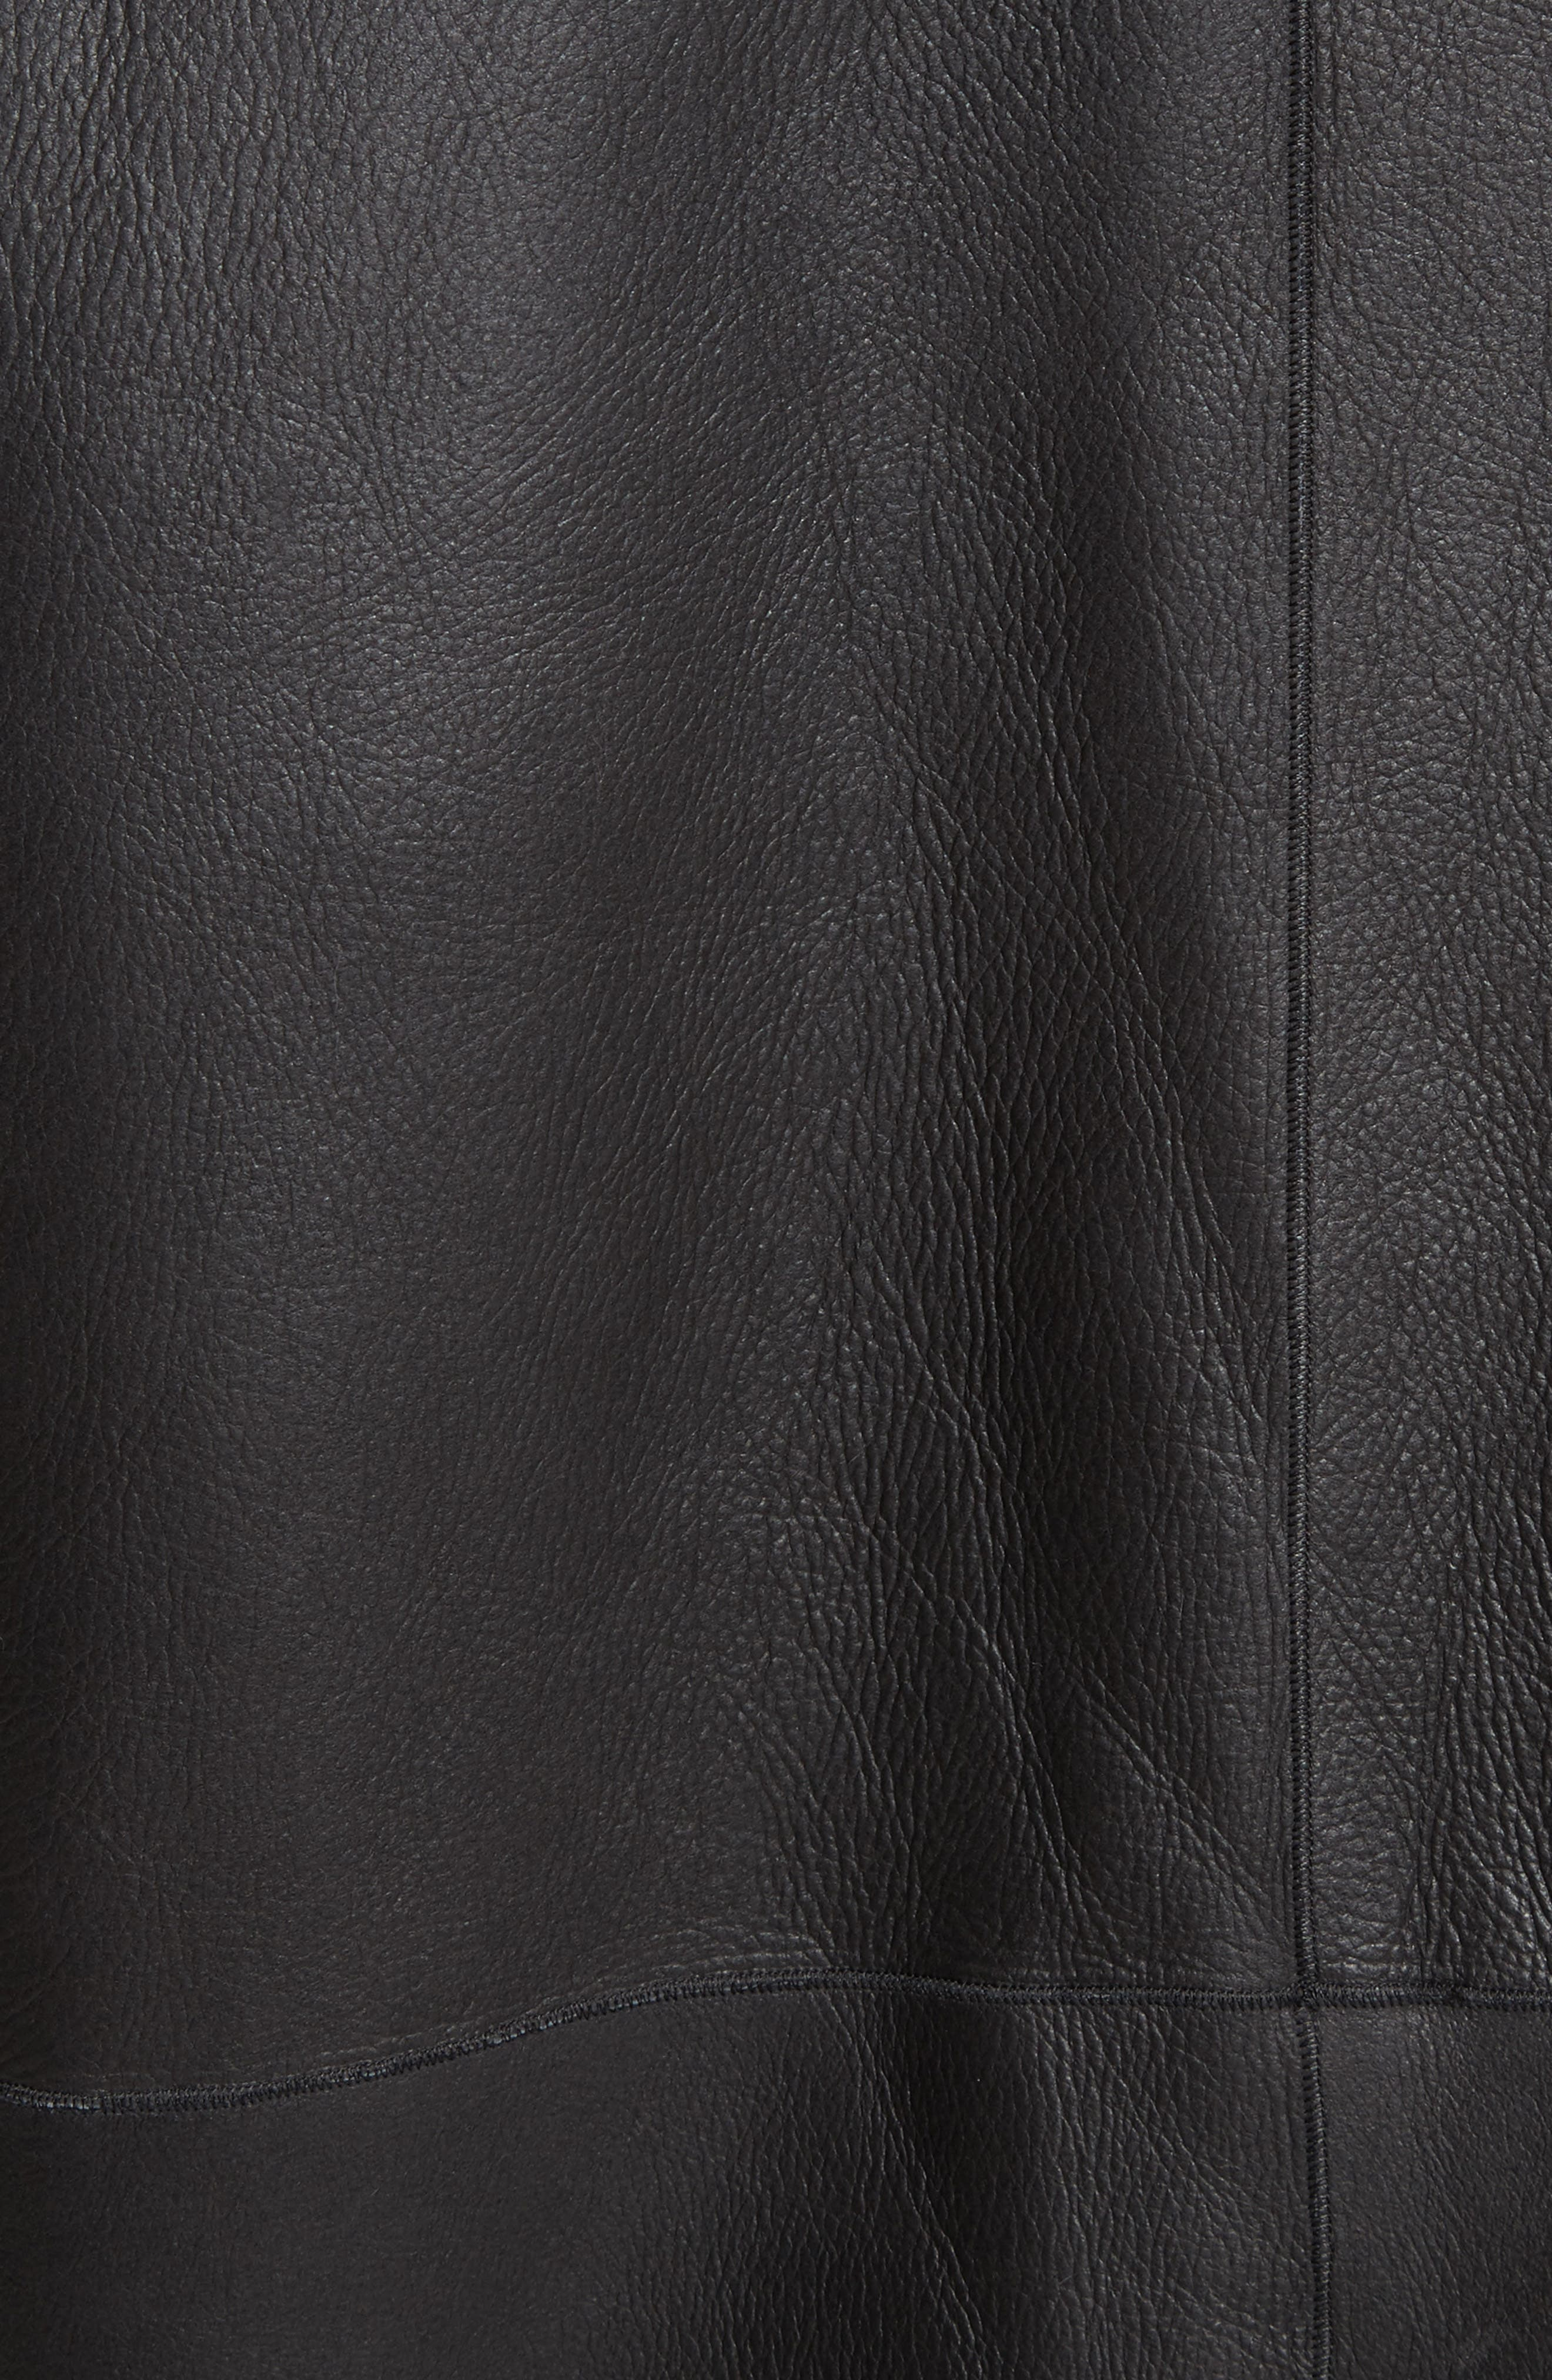 Shawl Collar Genuine Shearling Reversible Coat,                             Alternate thumbnail 6, color,                             012